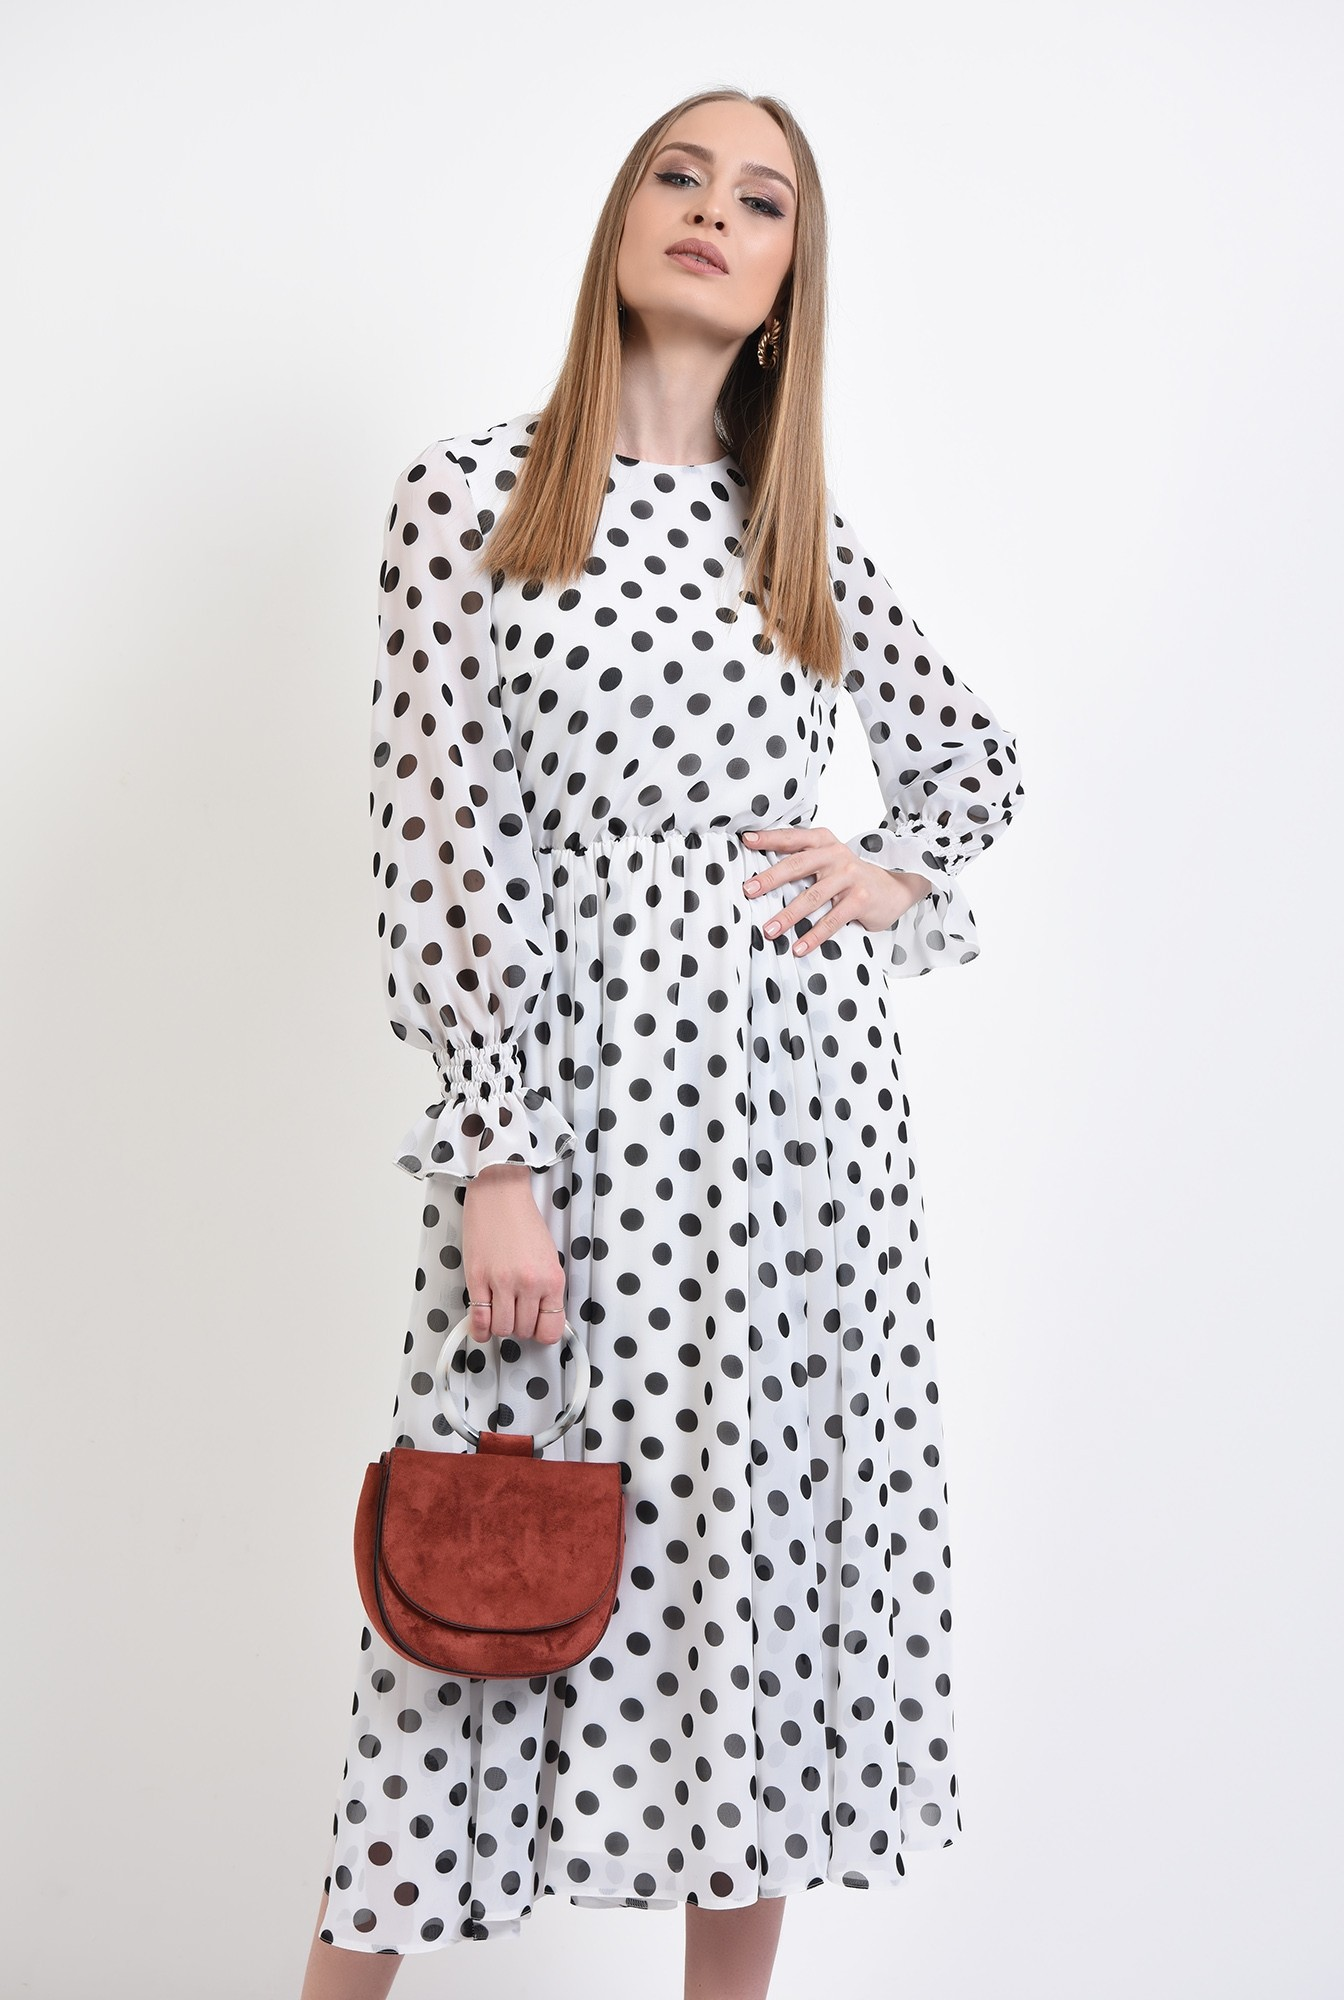 0 - 360 - rochie lunga, clos, cu buline, alb-negru, mansete volan, Poema